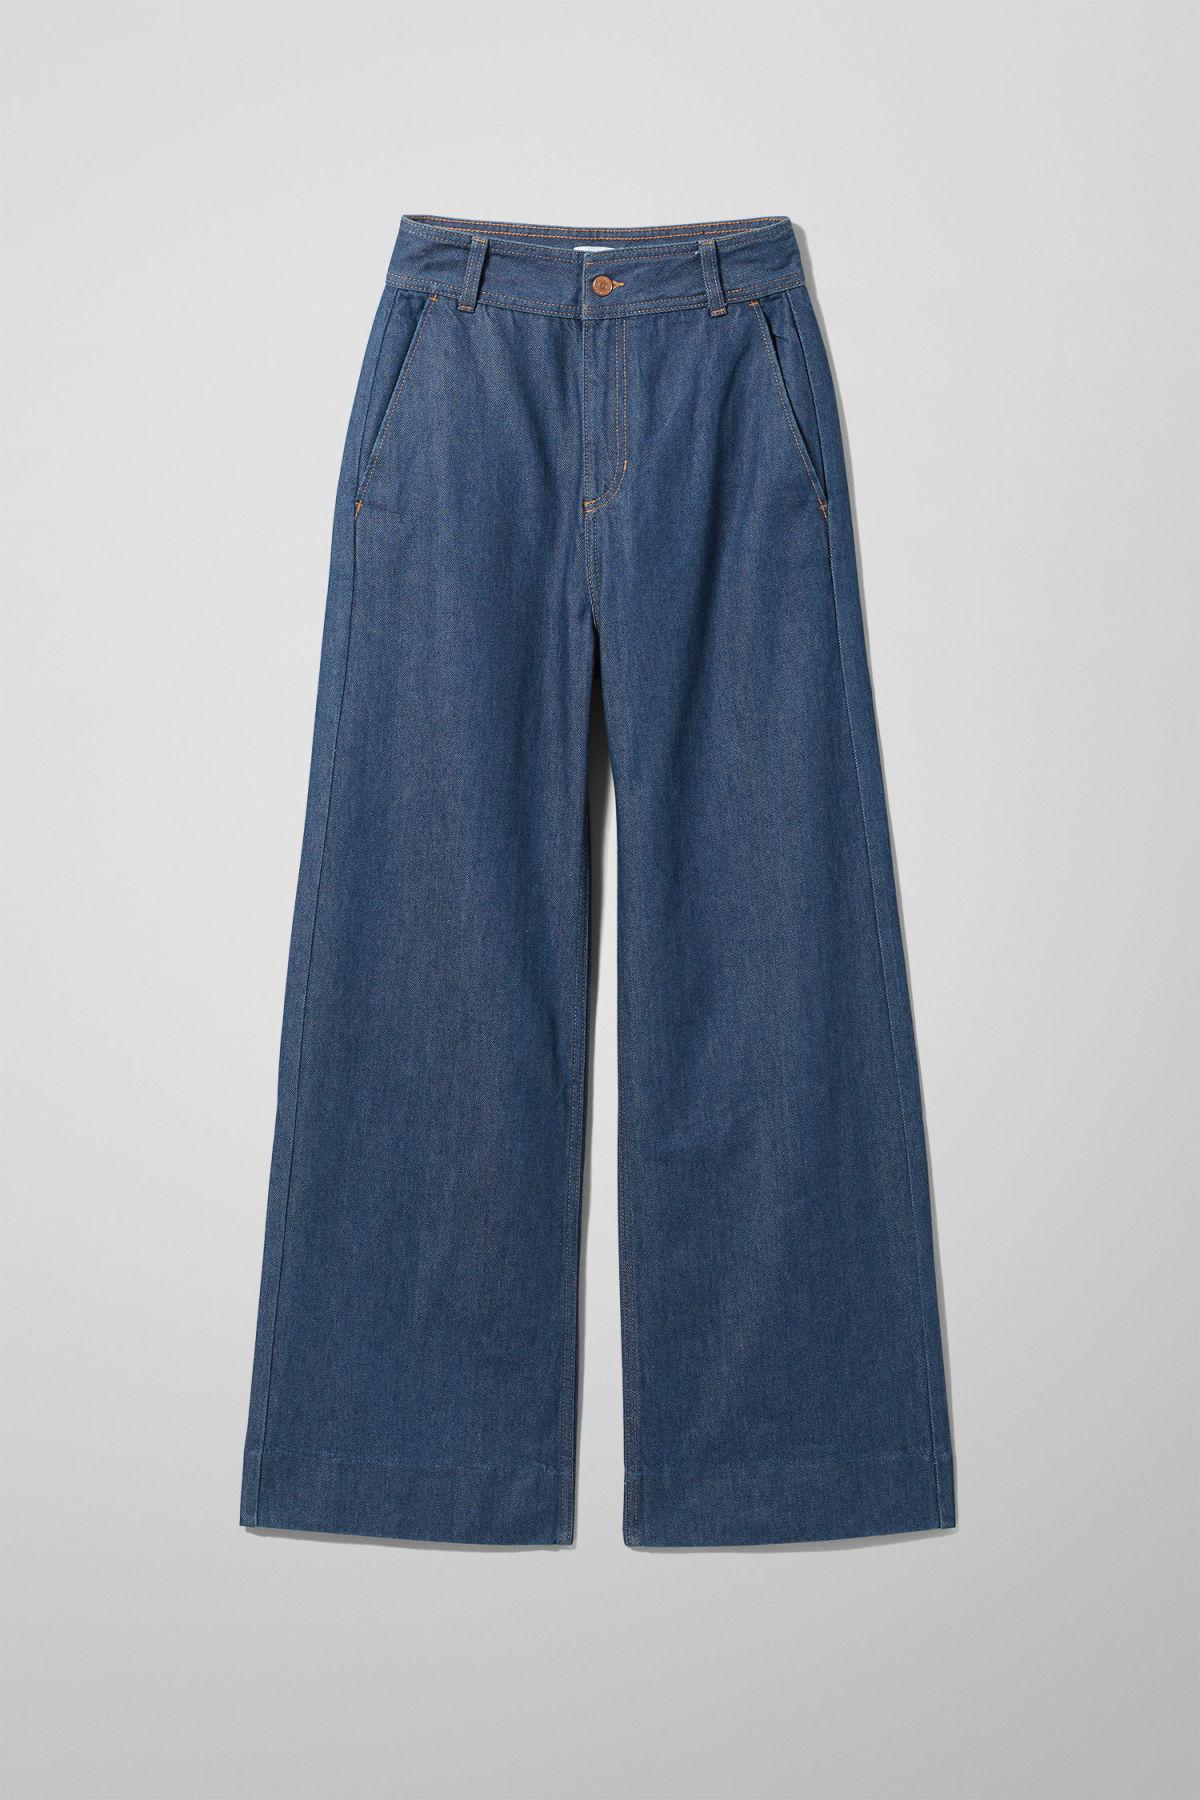 Cory Denim Trousers - Blue-42